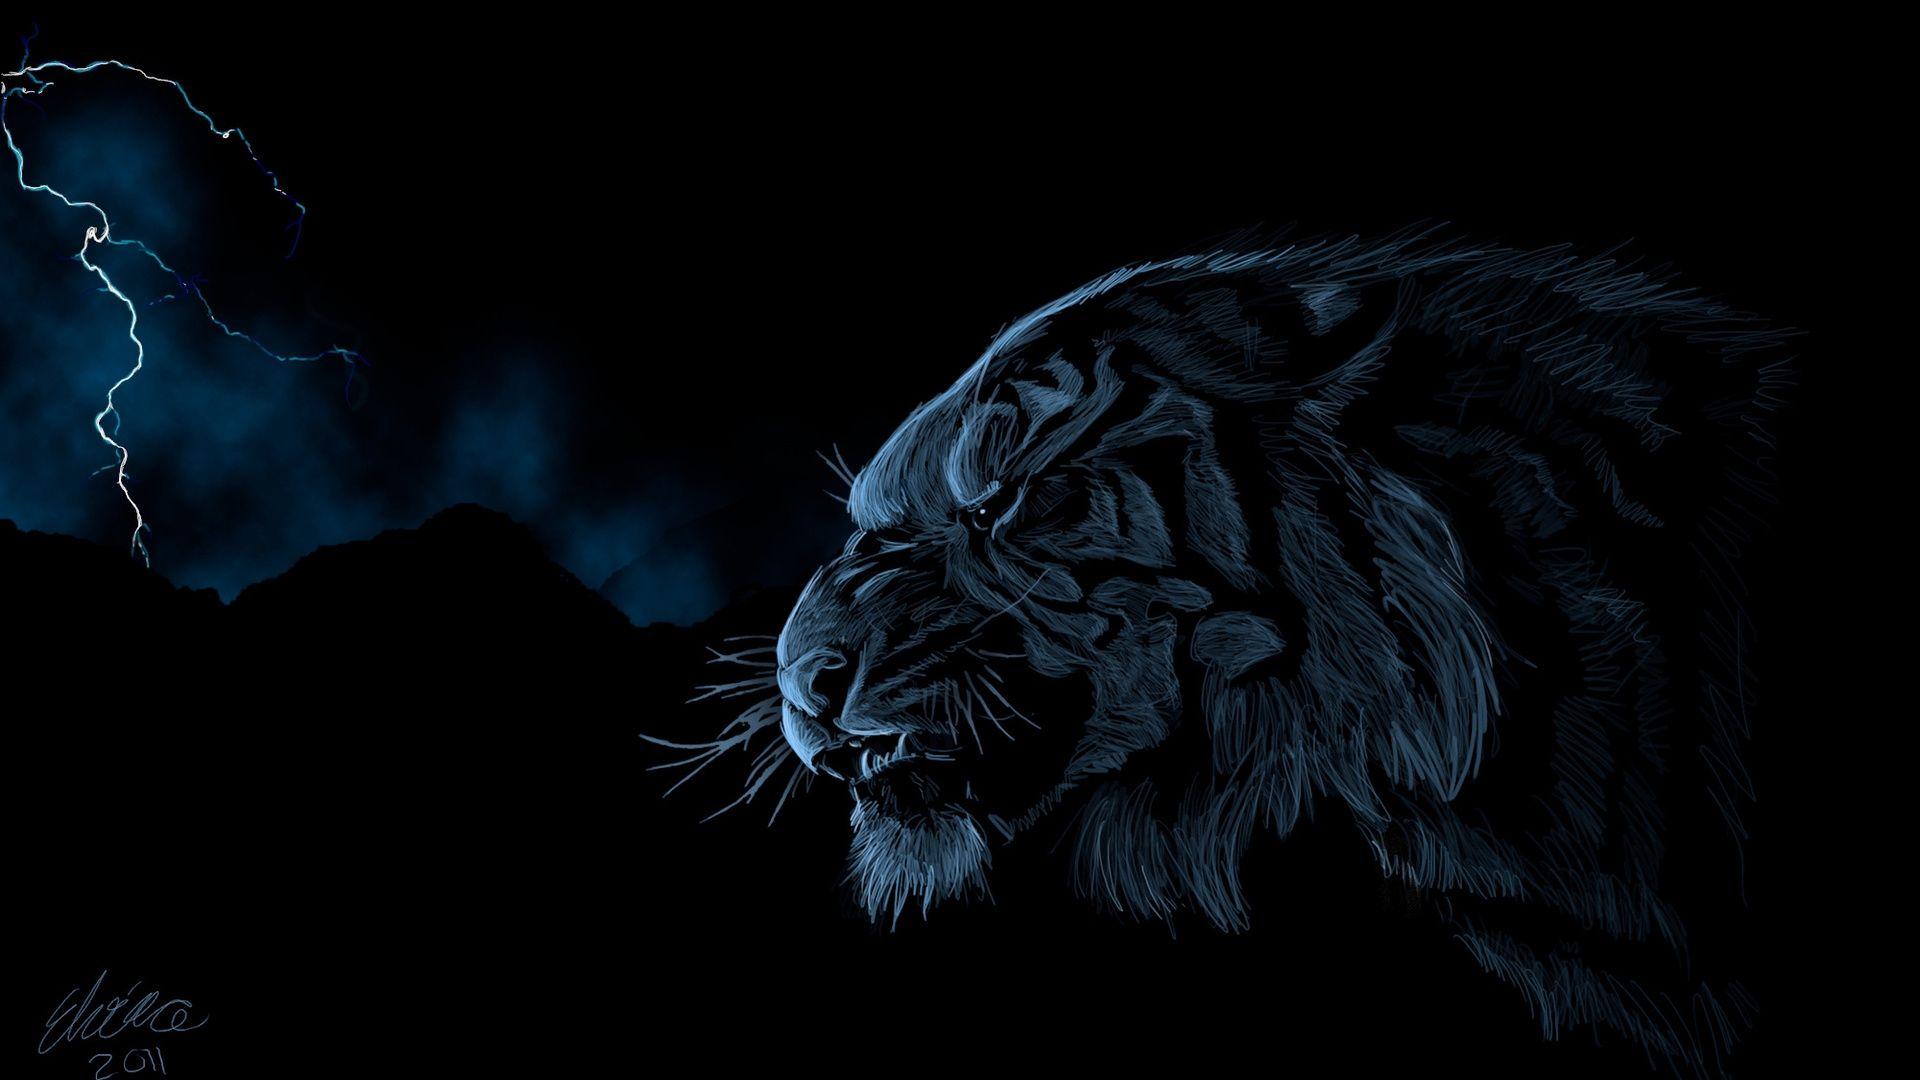 Tiger Art profile, PC Wallpaper